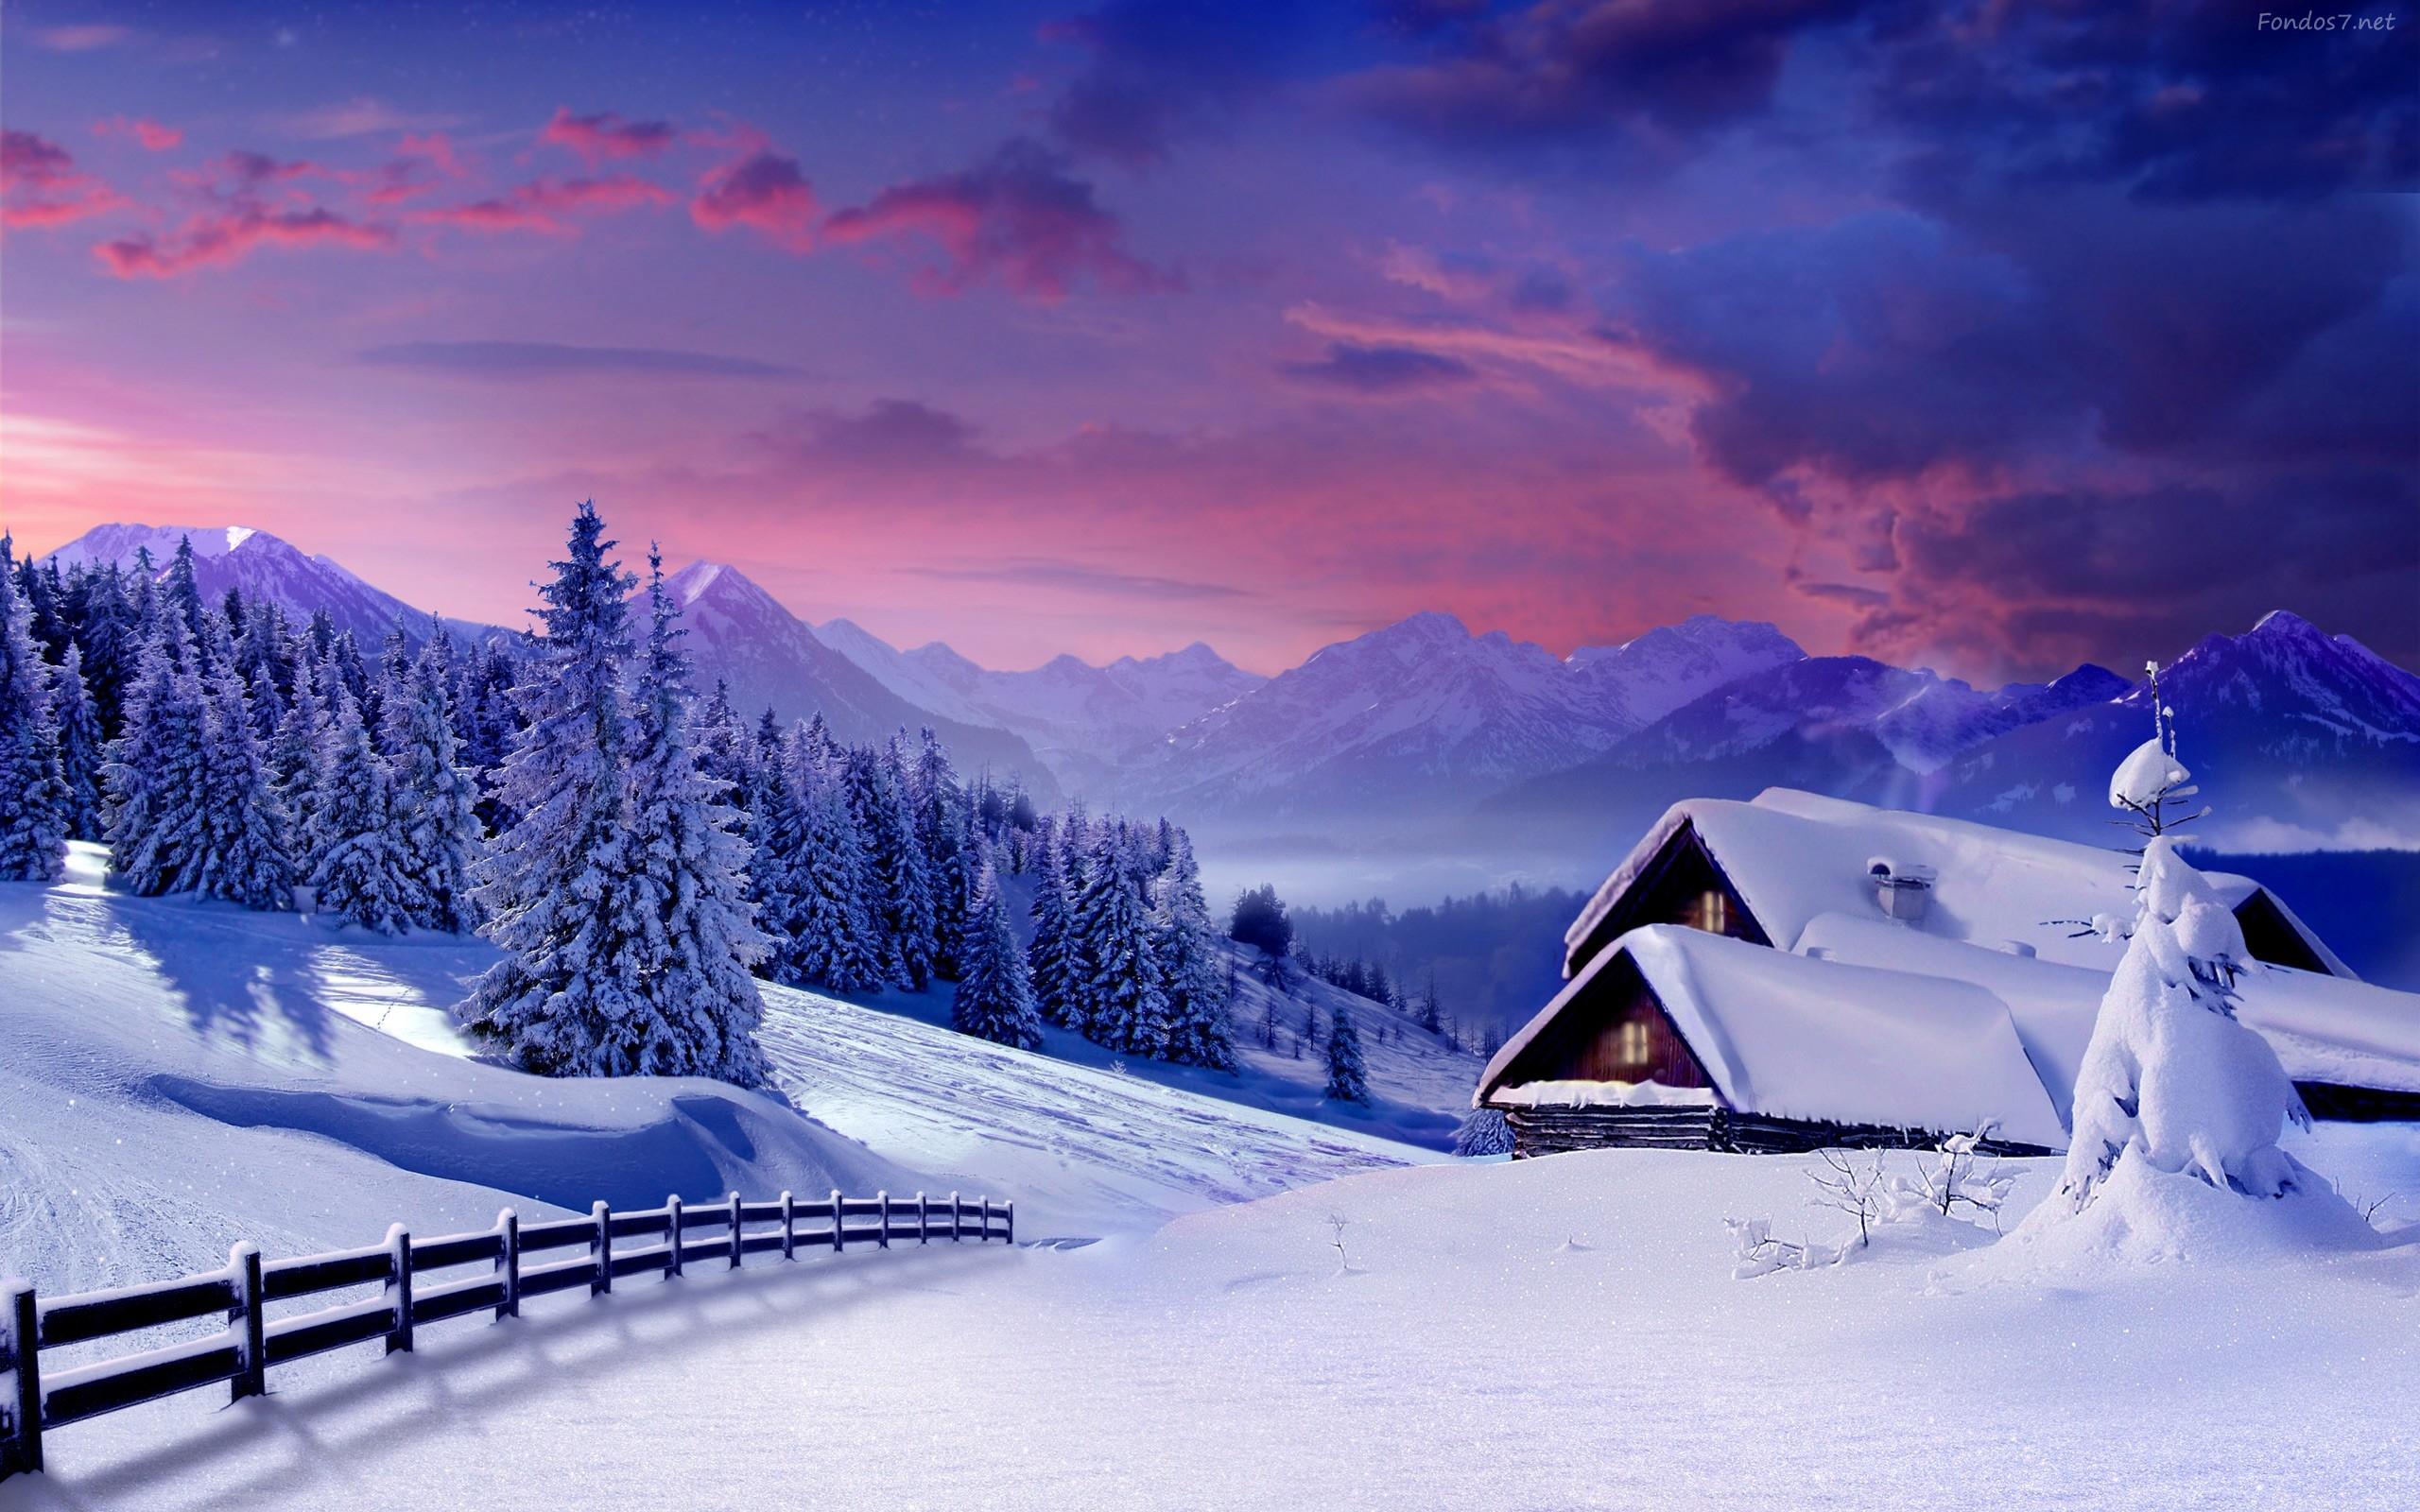 cuento-infantil-las-noches-de-nieve